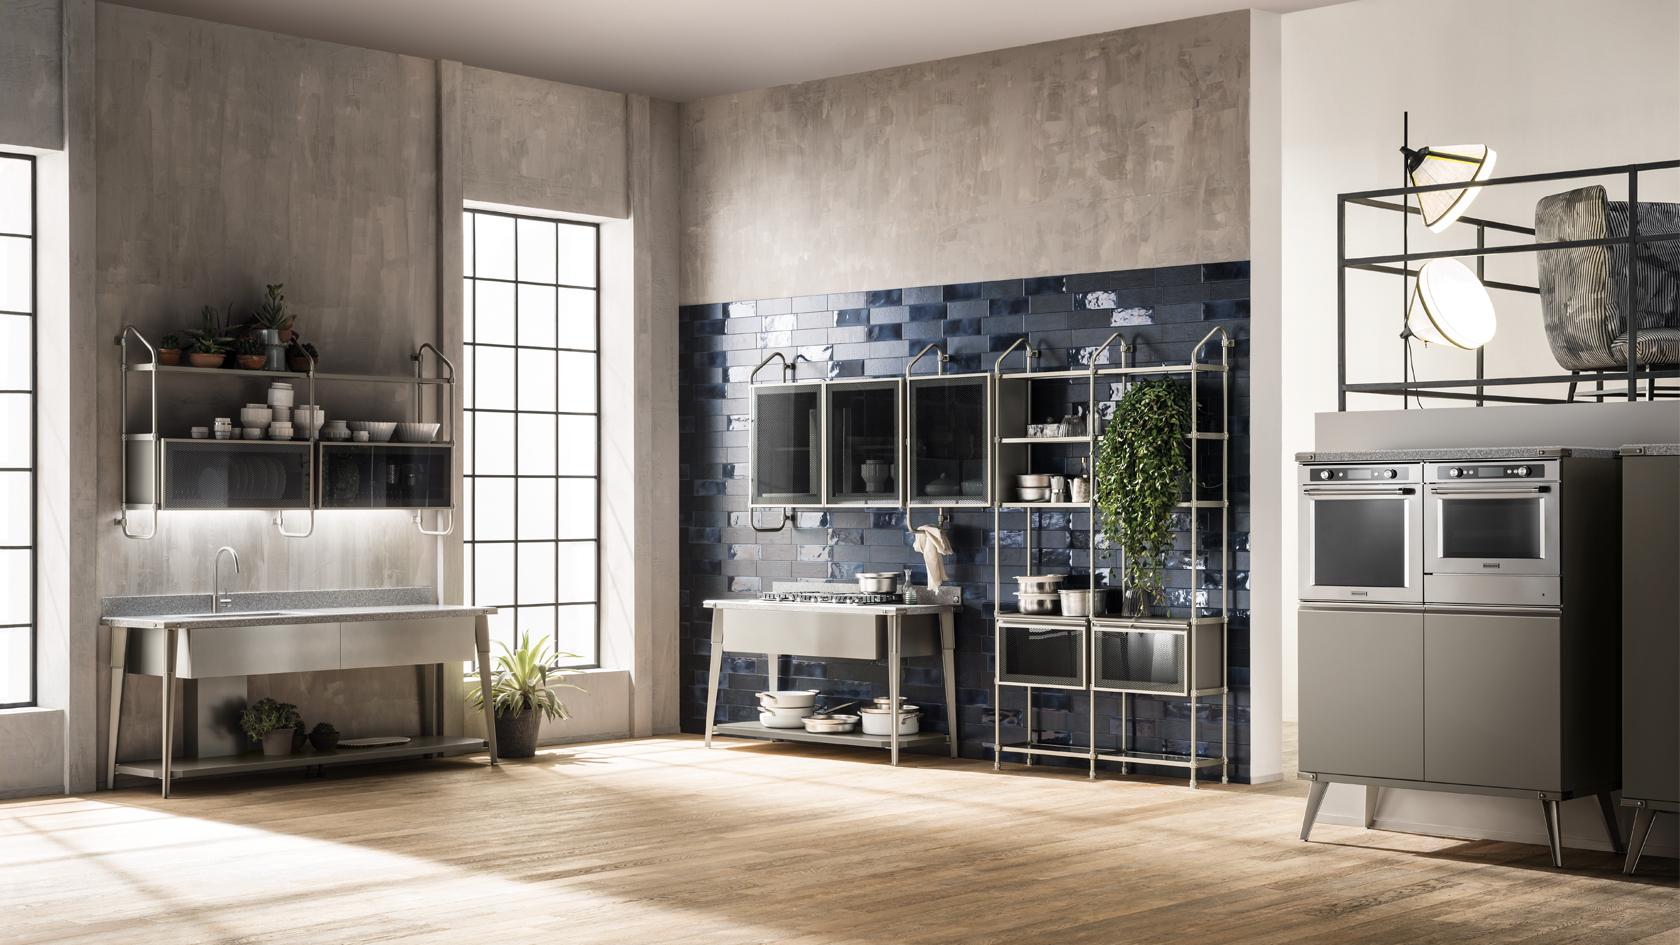 Cucina Moderna Scavolini Diesel Open Workshop | Mobili Incardone